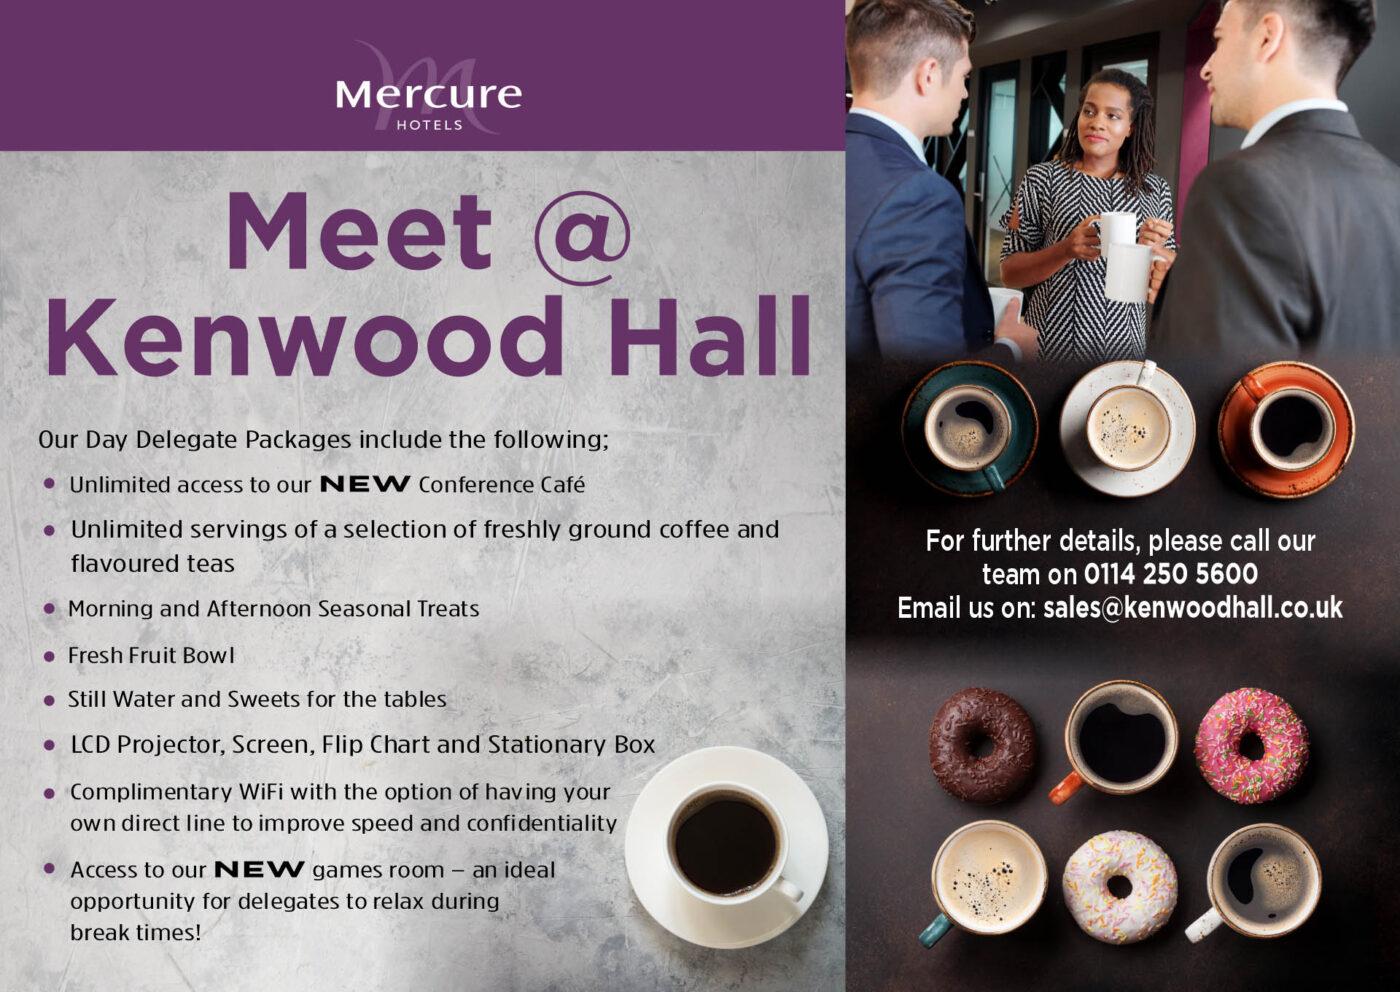 Mercure Kenwood Hotel Sheffield Conference Cafe 1